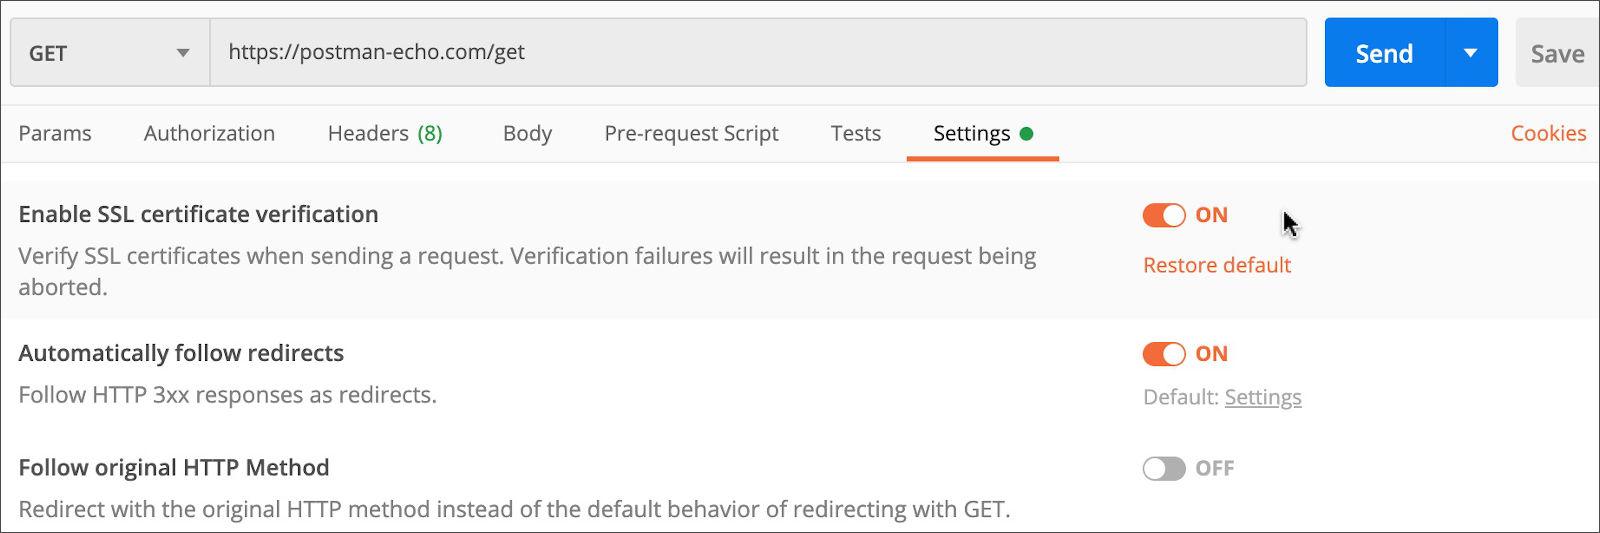 Request SSL